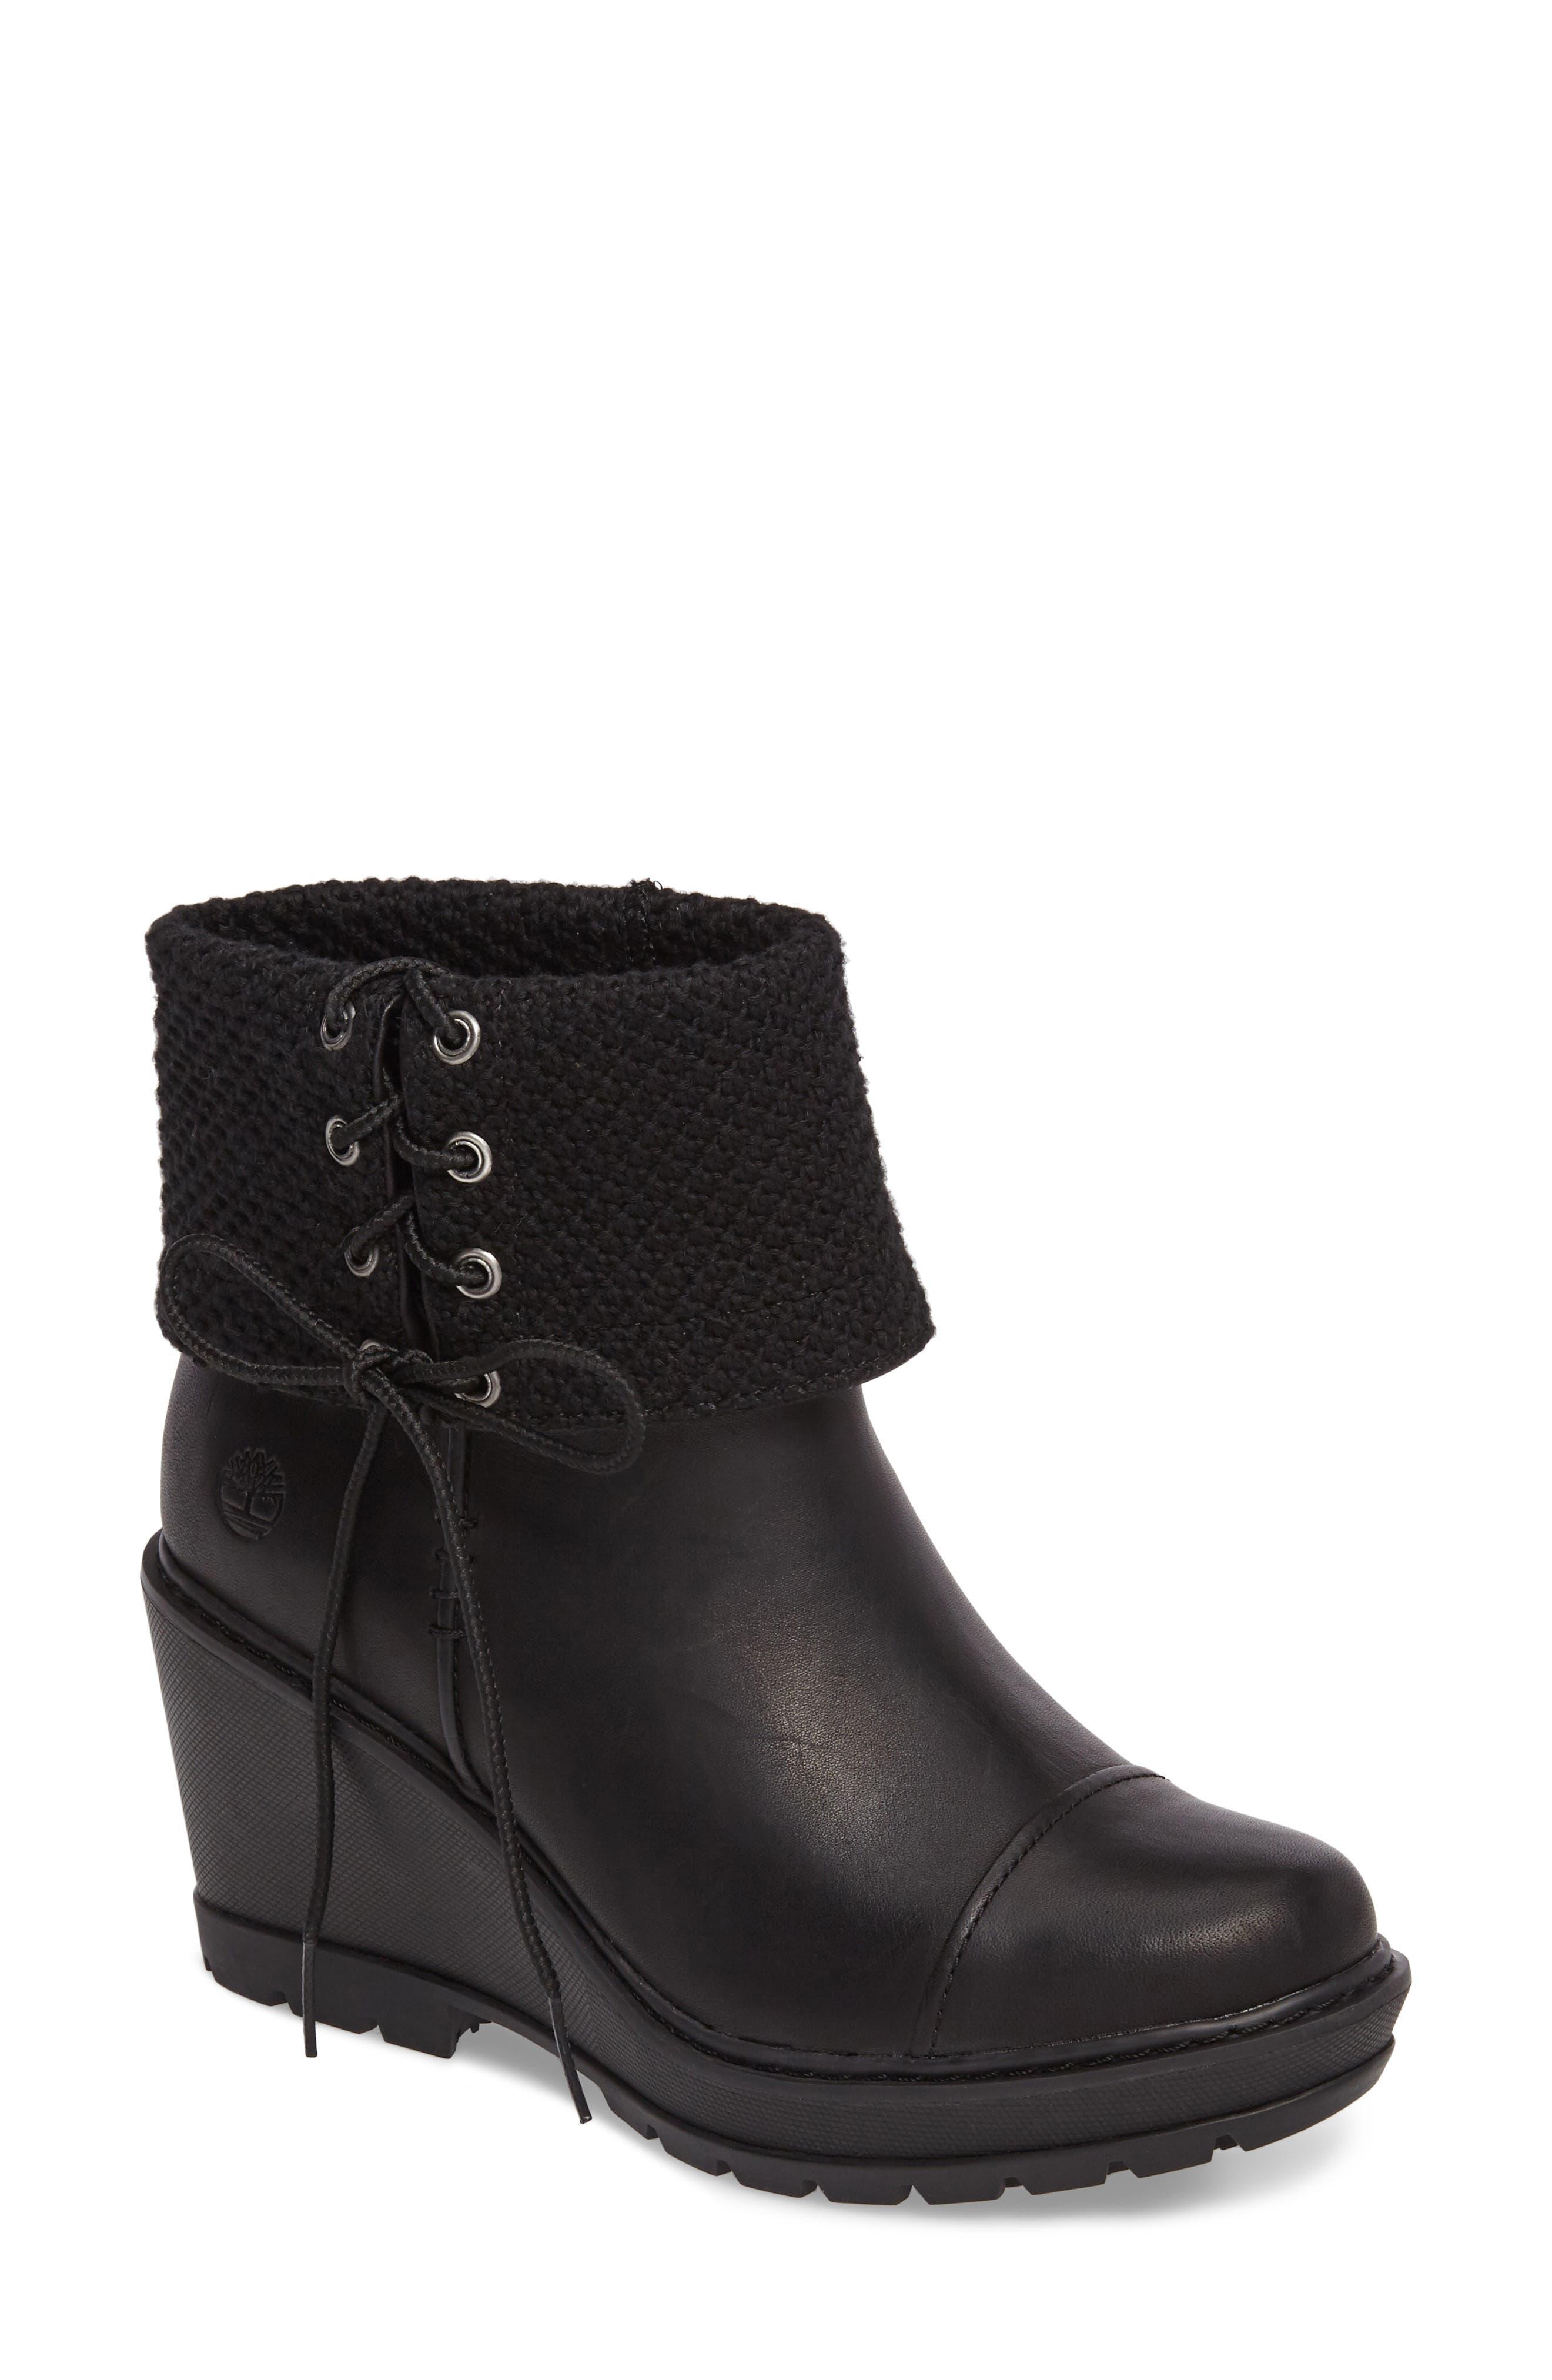 Alternate Image 1 Selected - Timberland Kellis Fold Down Water Resistant Boot (Women)